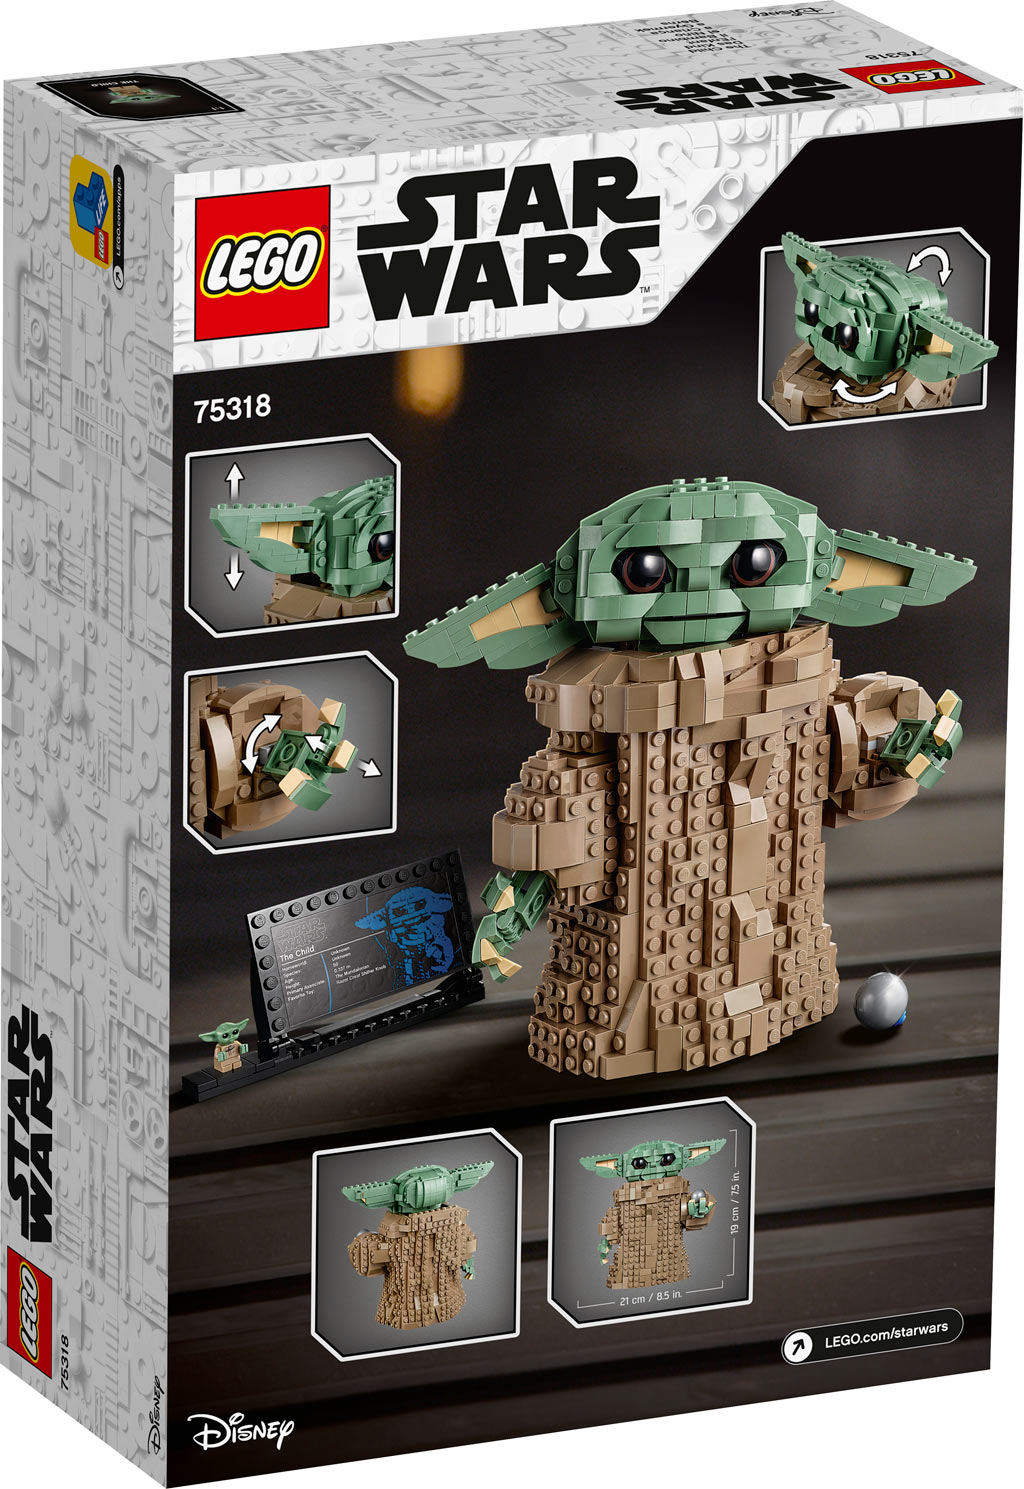 LEGO Star Wars 75318 The Child Box